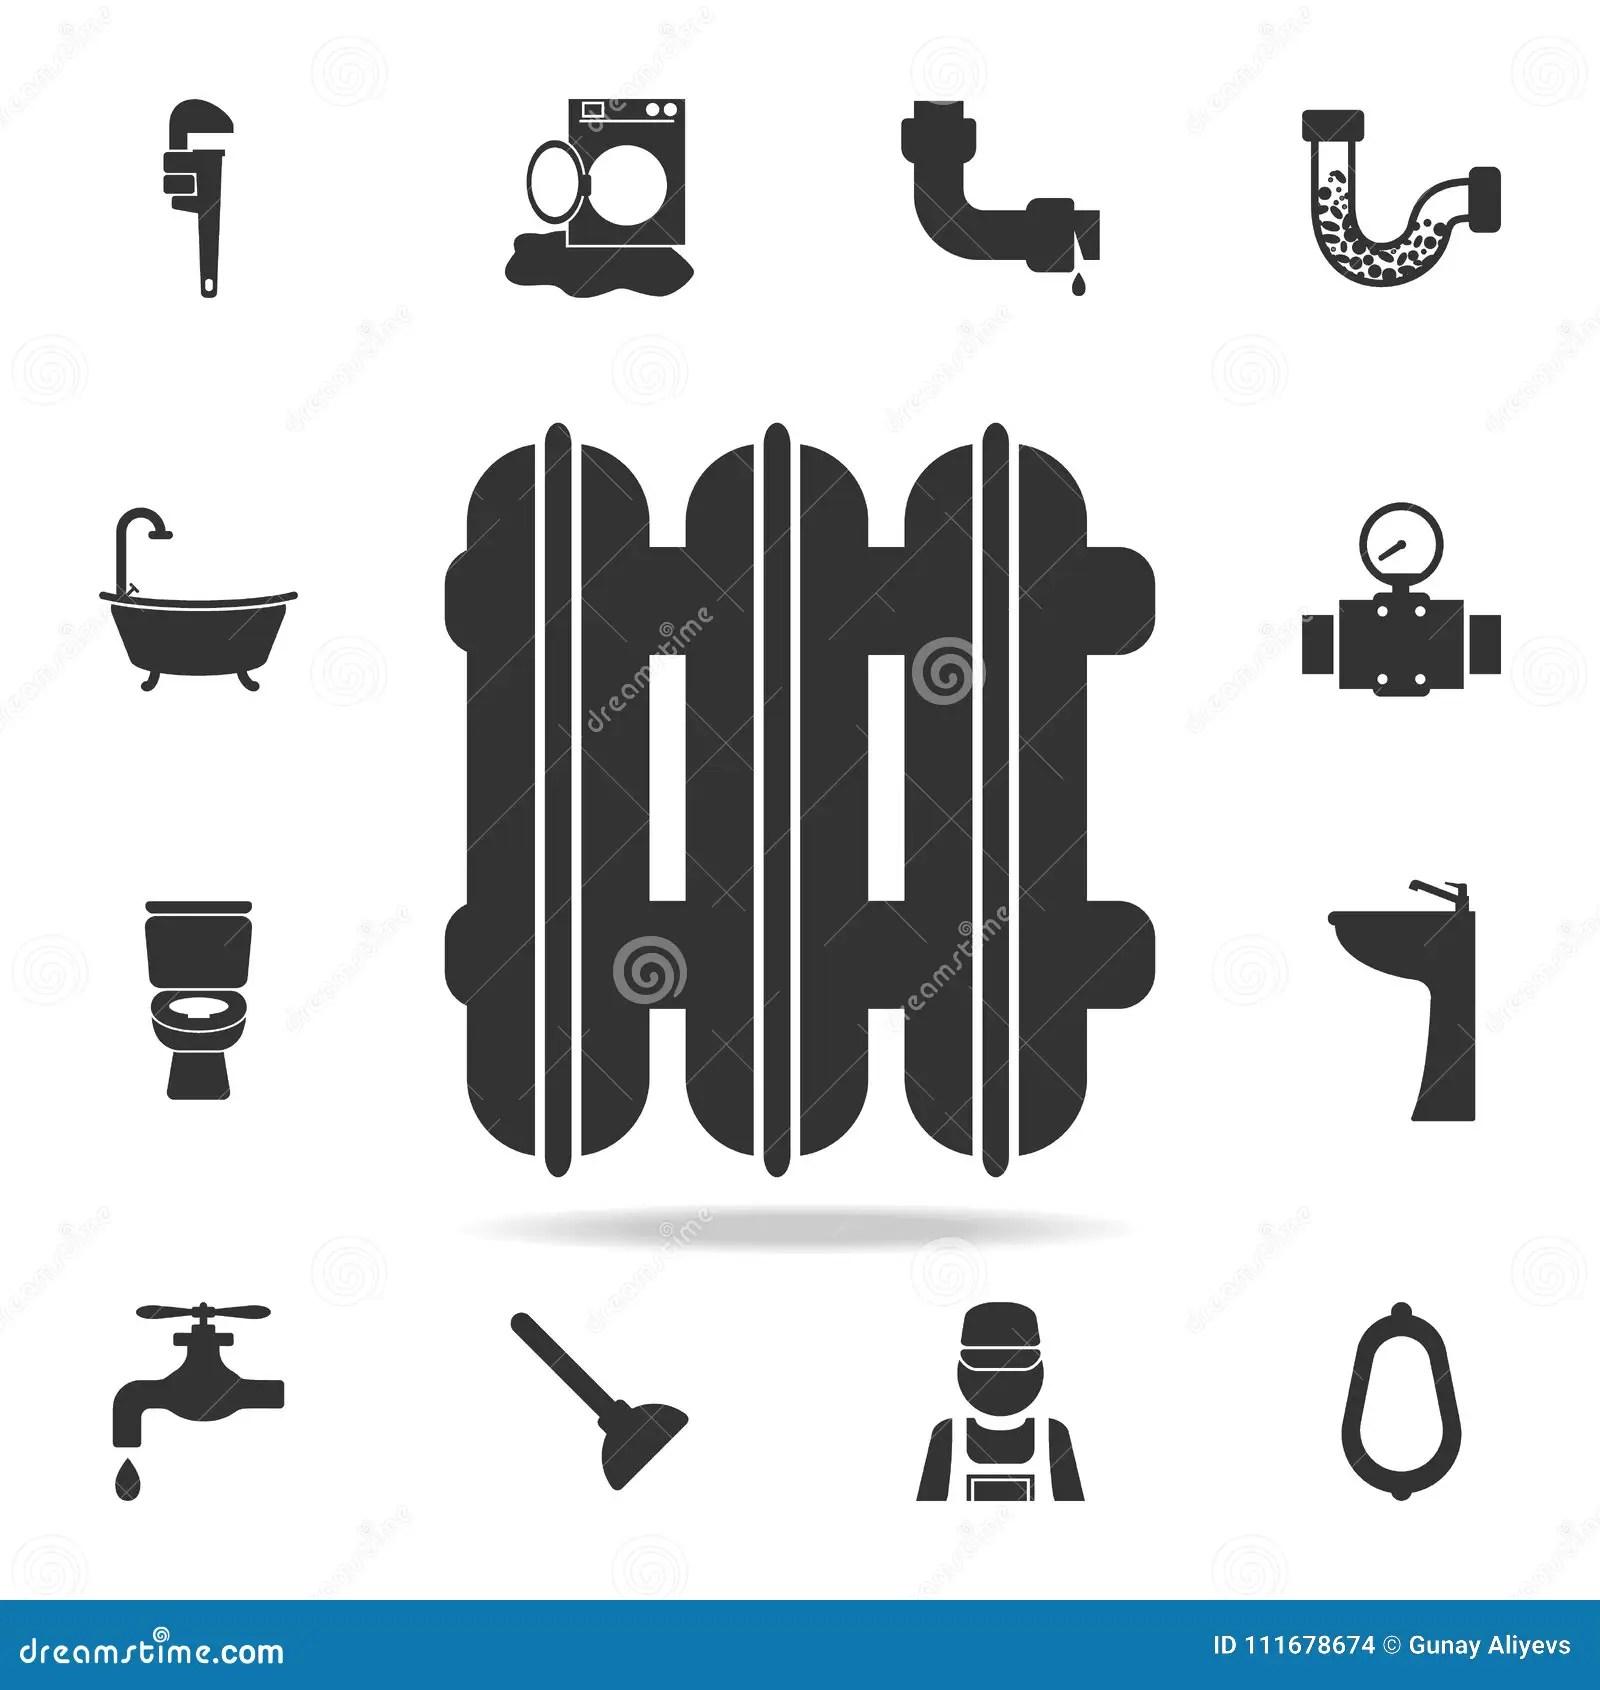 Black Radiator Icon With Shadow Cartoon Vector